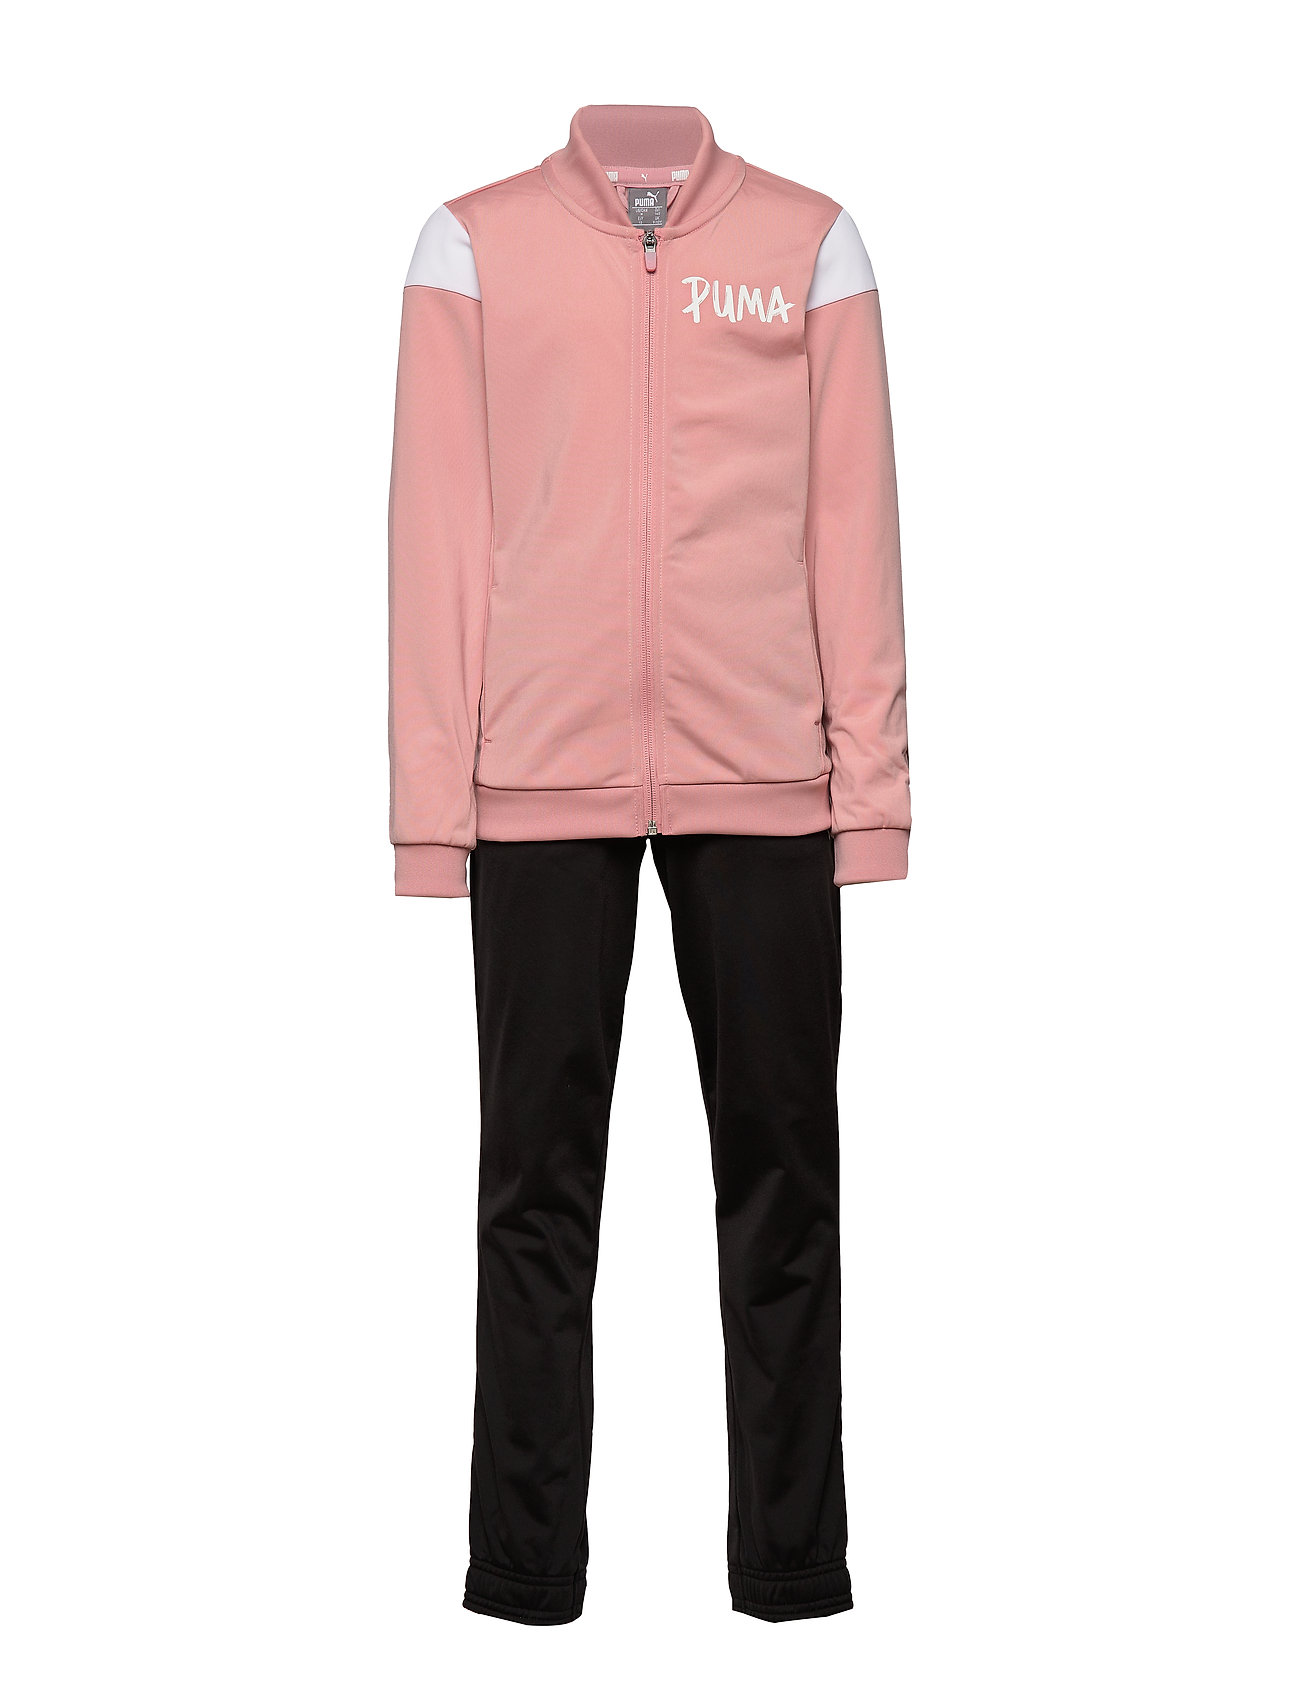 PUMA Poly Suit  G - BRIDAL ROSE